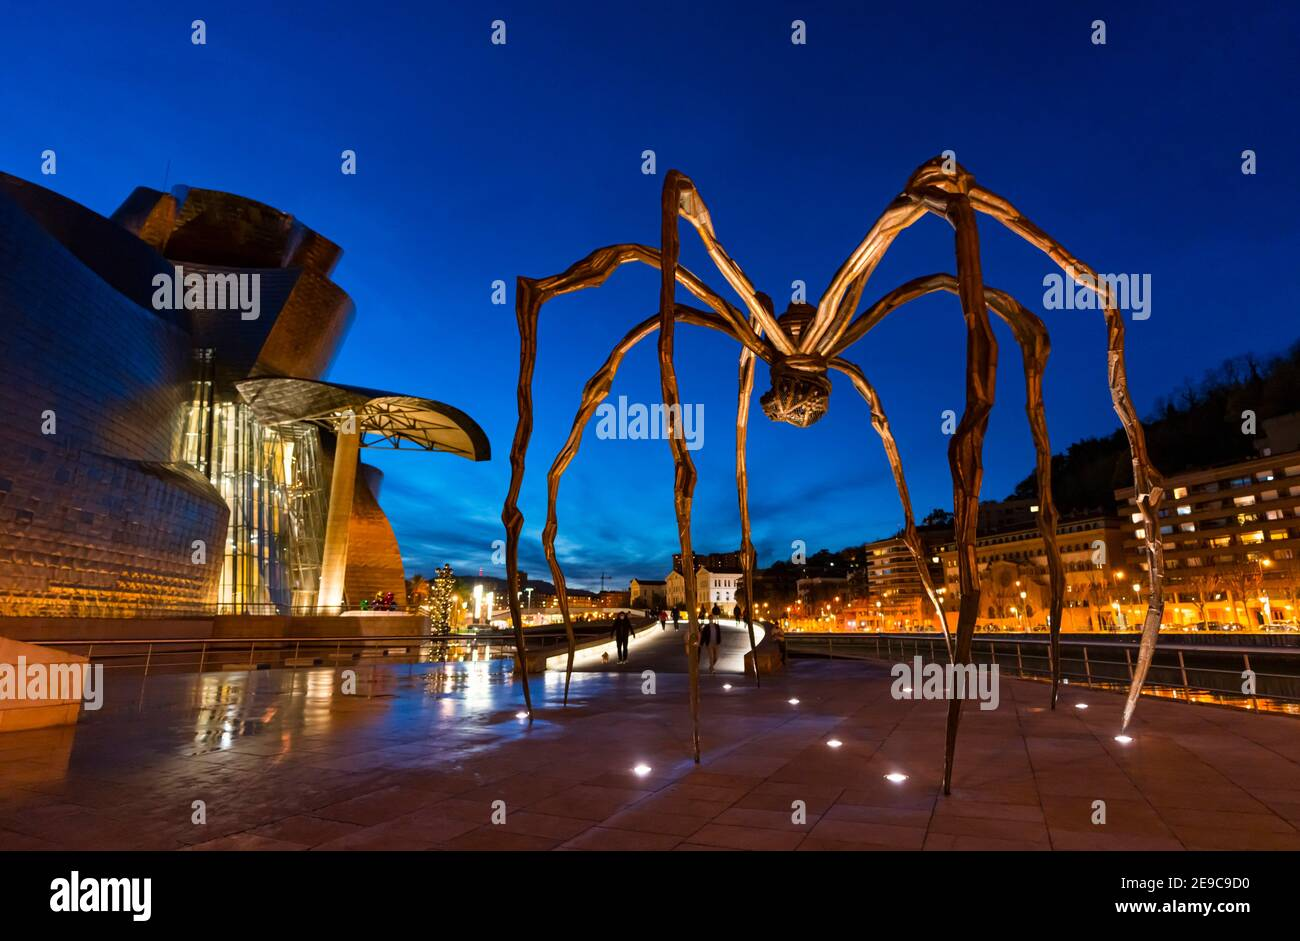 "Sculpture """"Mama"""" in the Guggenheim Museum in Bilbao, Bizkaia, Basque Country, Spain, Europe. Stock Photo"